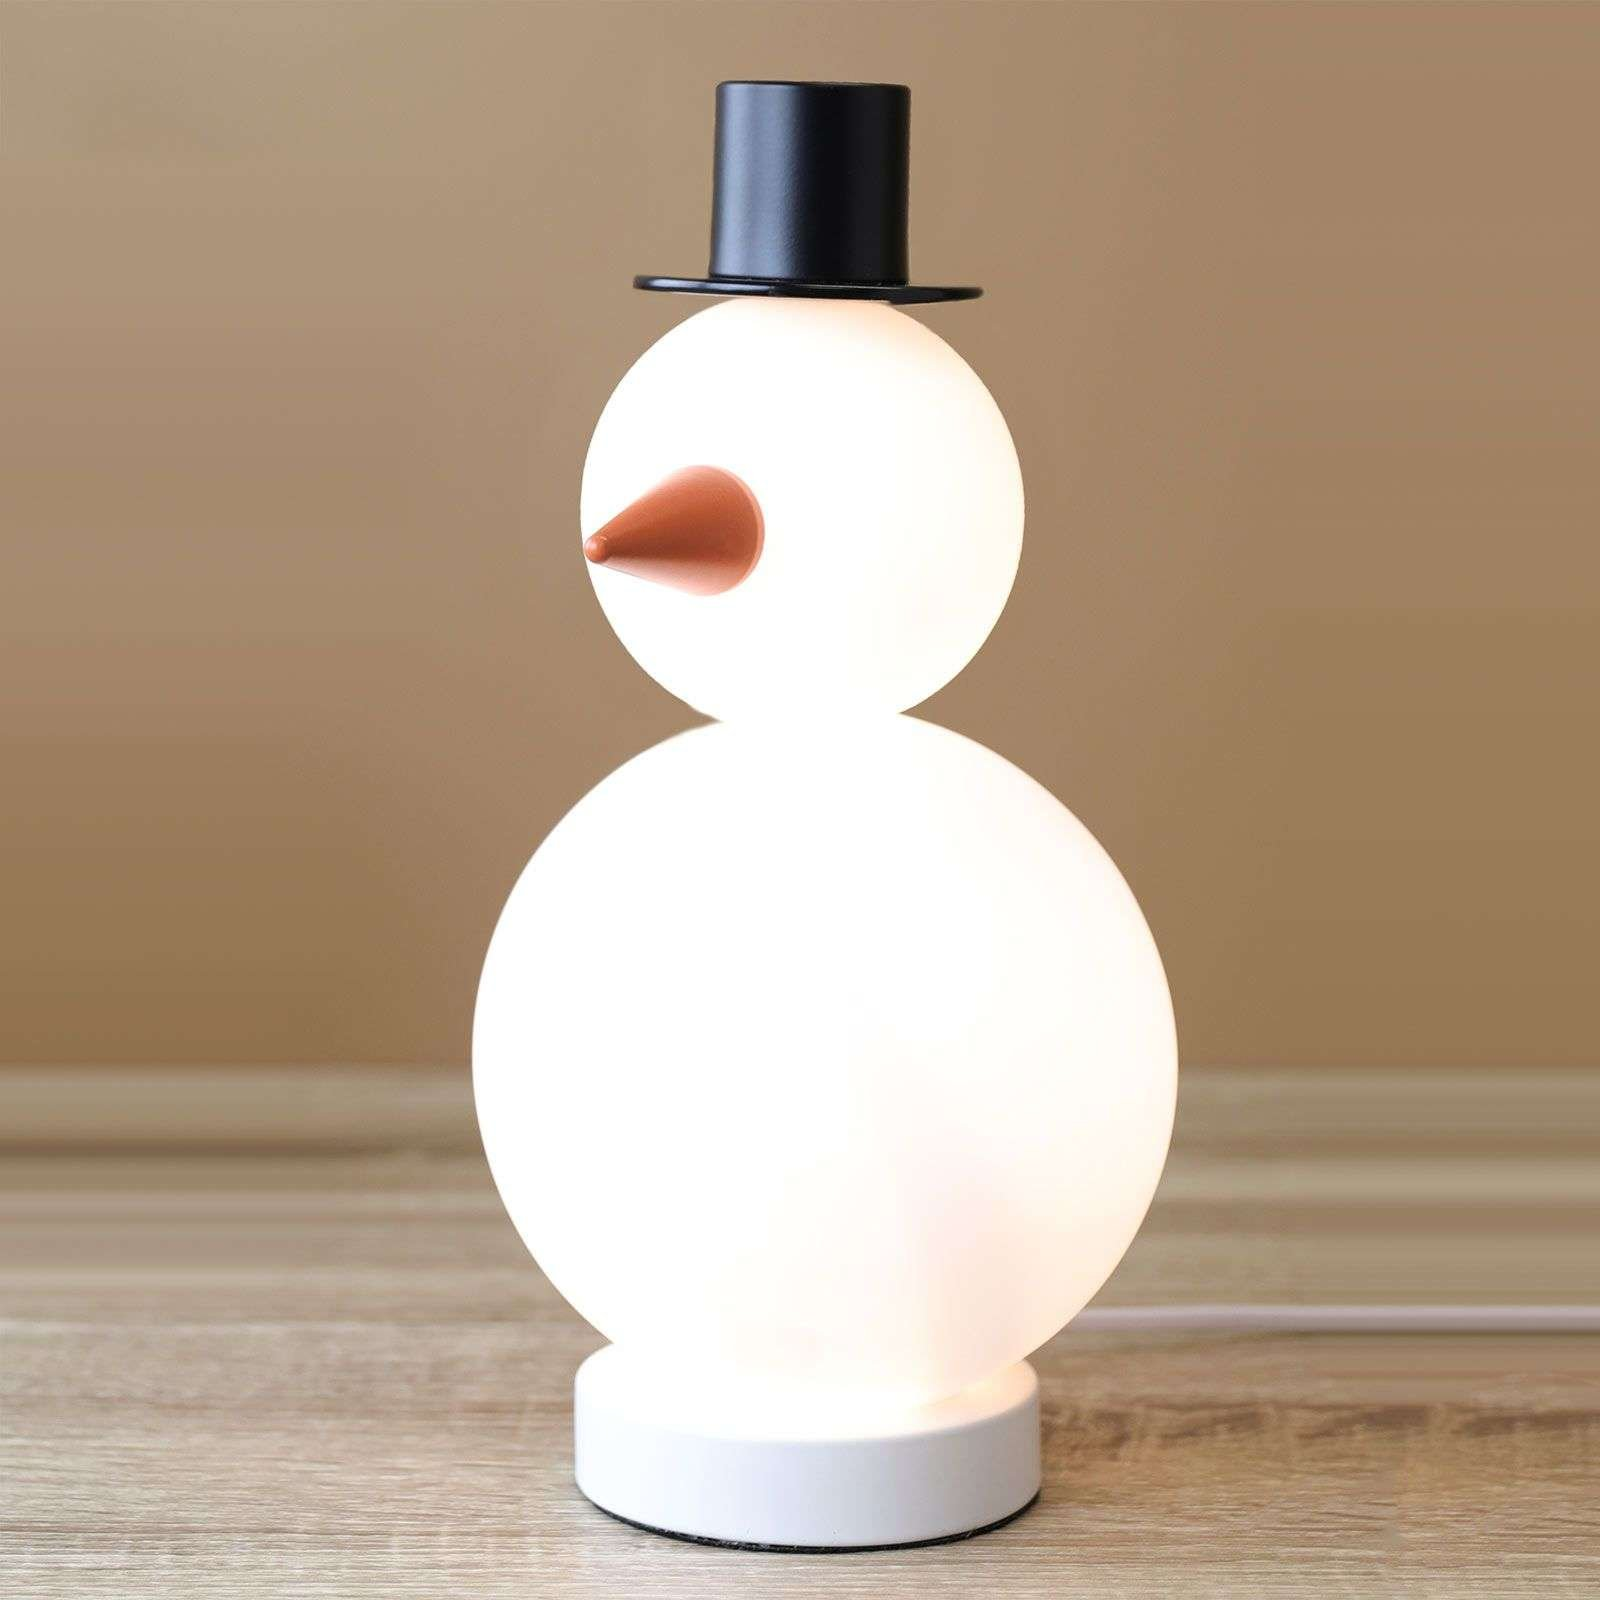 Snowman Bob decorative light  glass